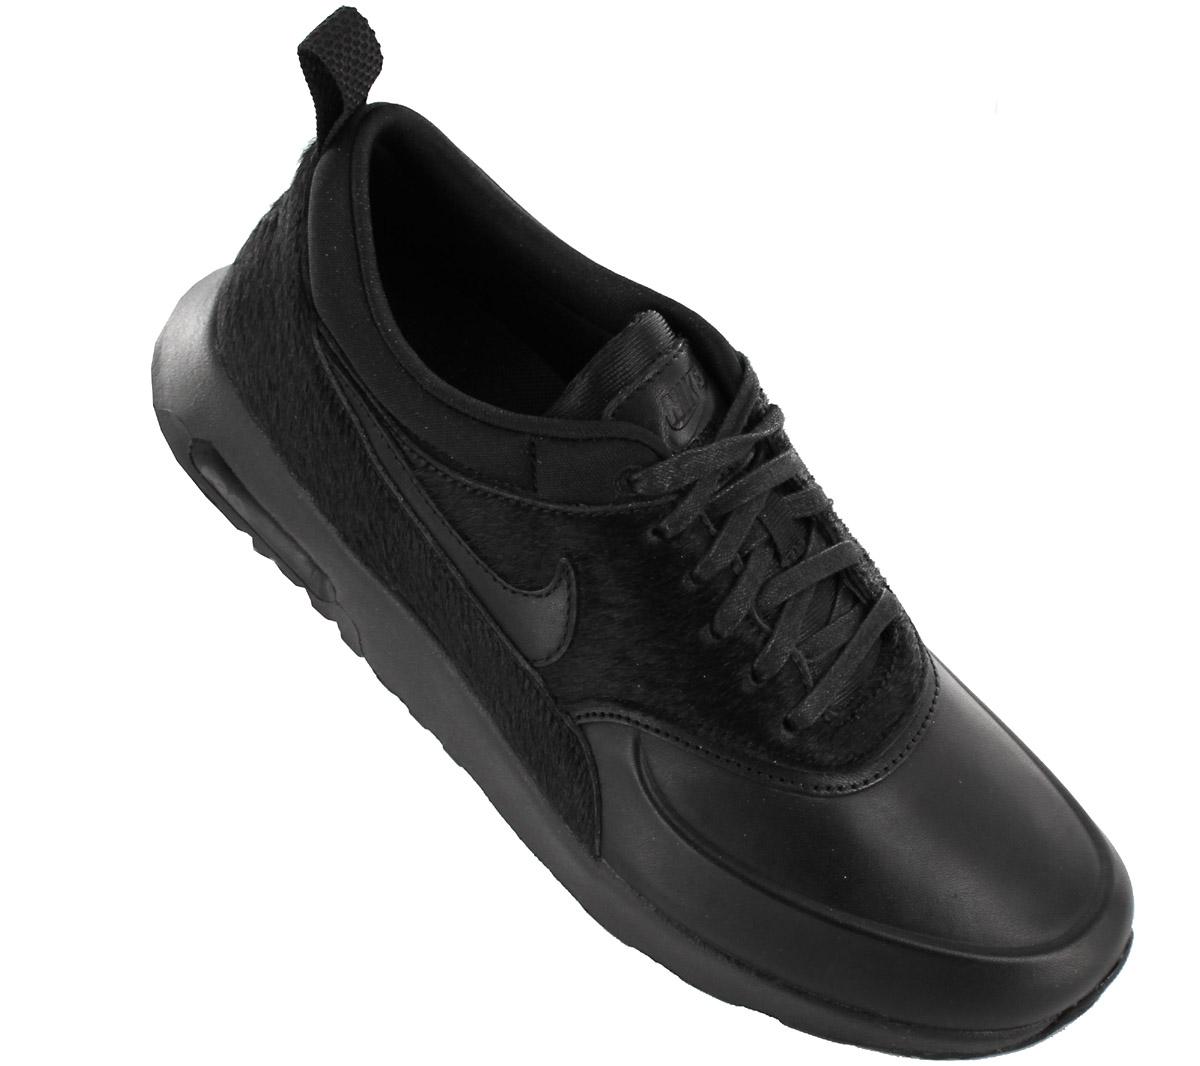 14a2946d319 Nike Air Max Thea Premium Ladies Sneaker Shoes Leather Black 616723 ...